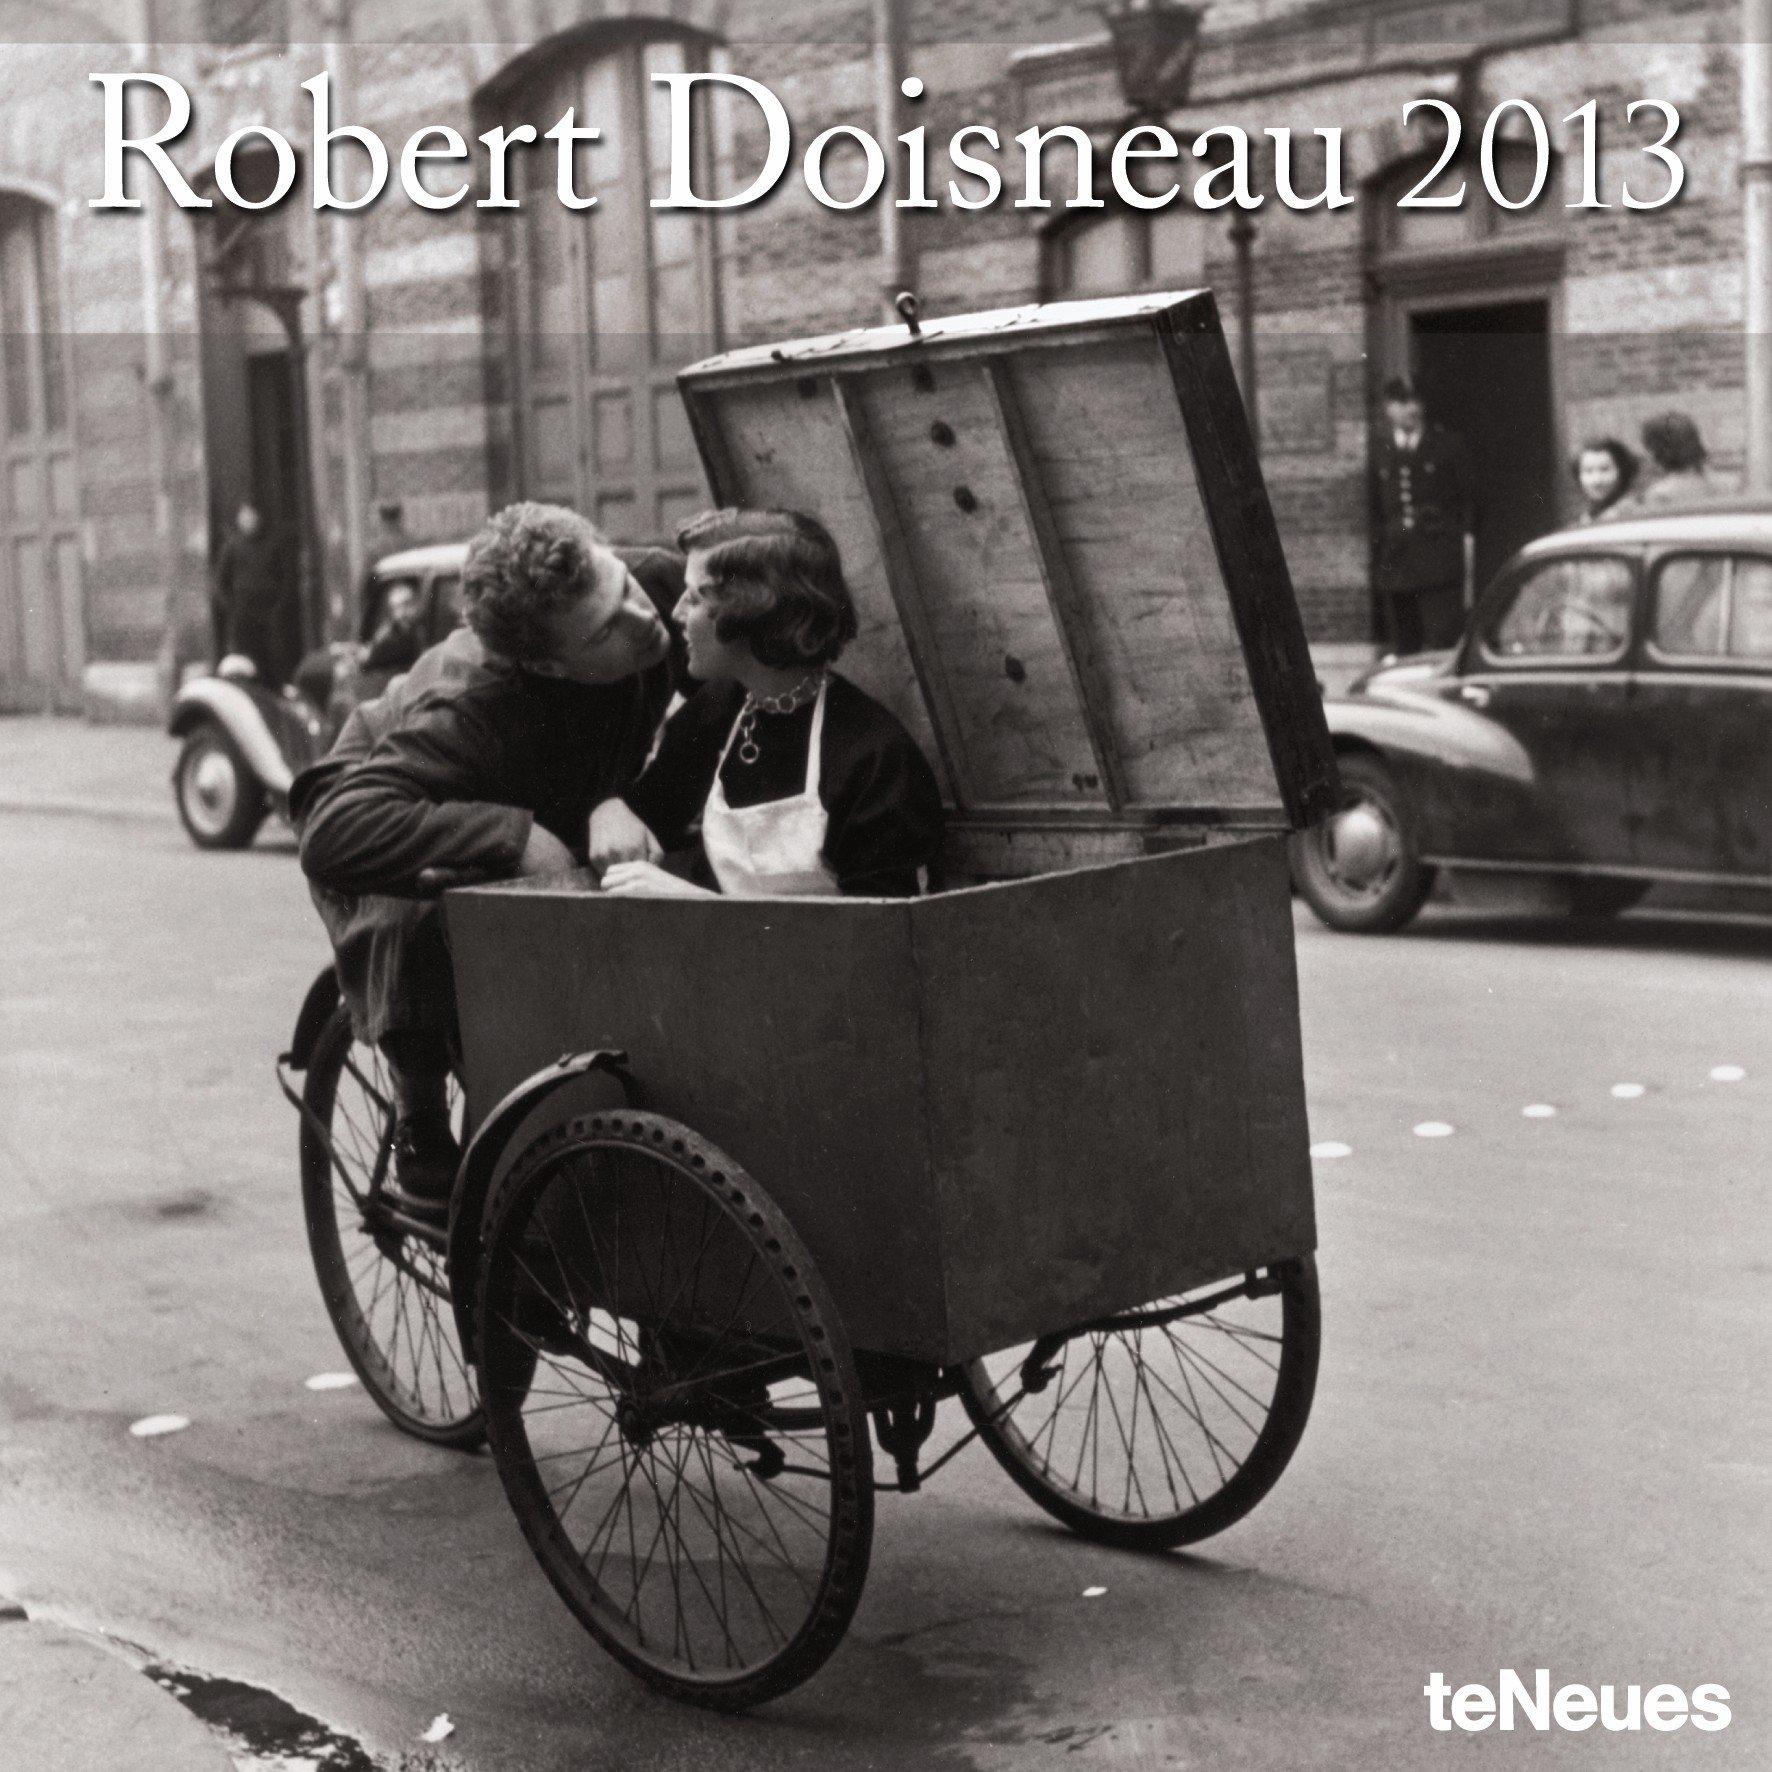 Robert Doisneau 2013 Broschürenkalender